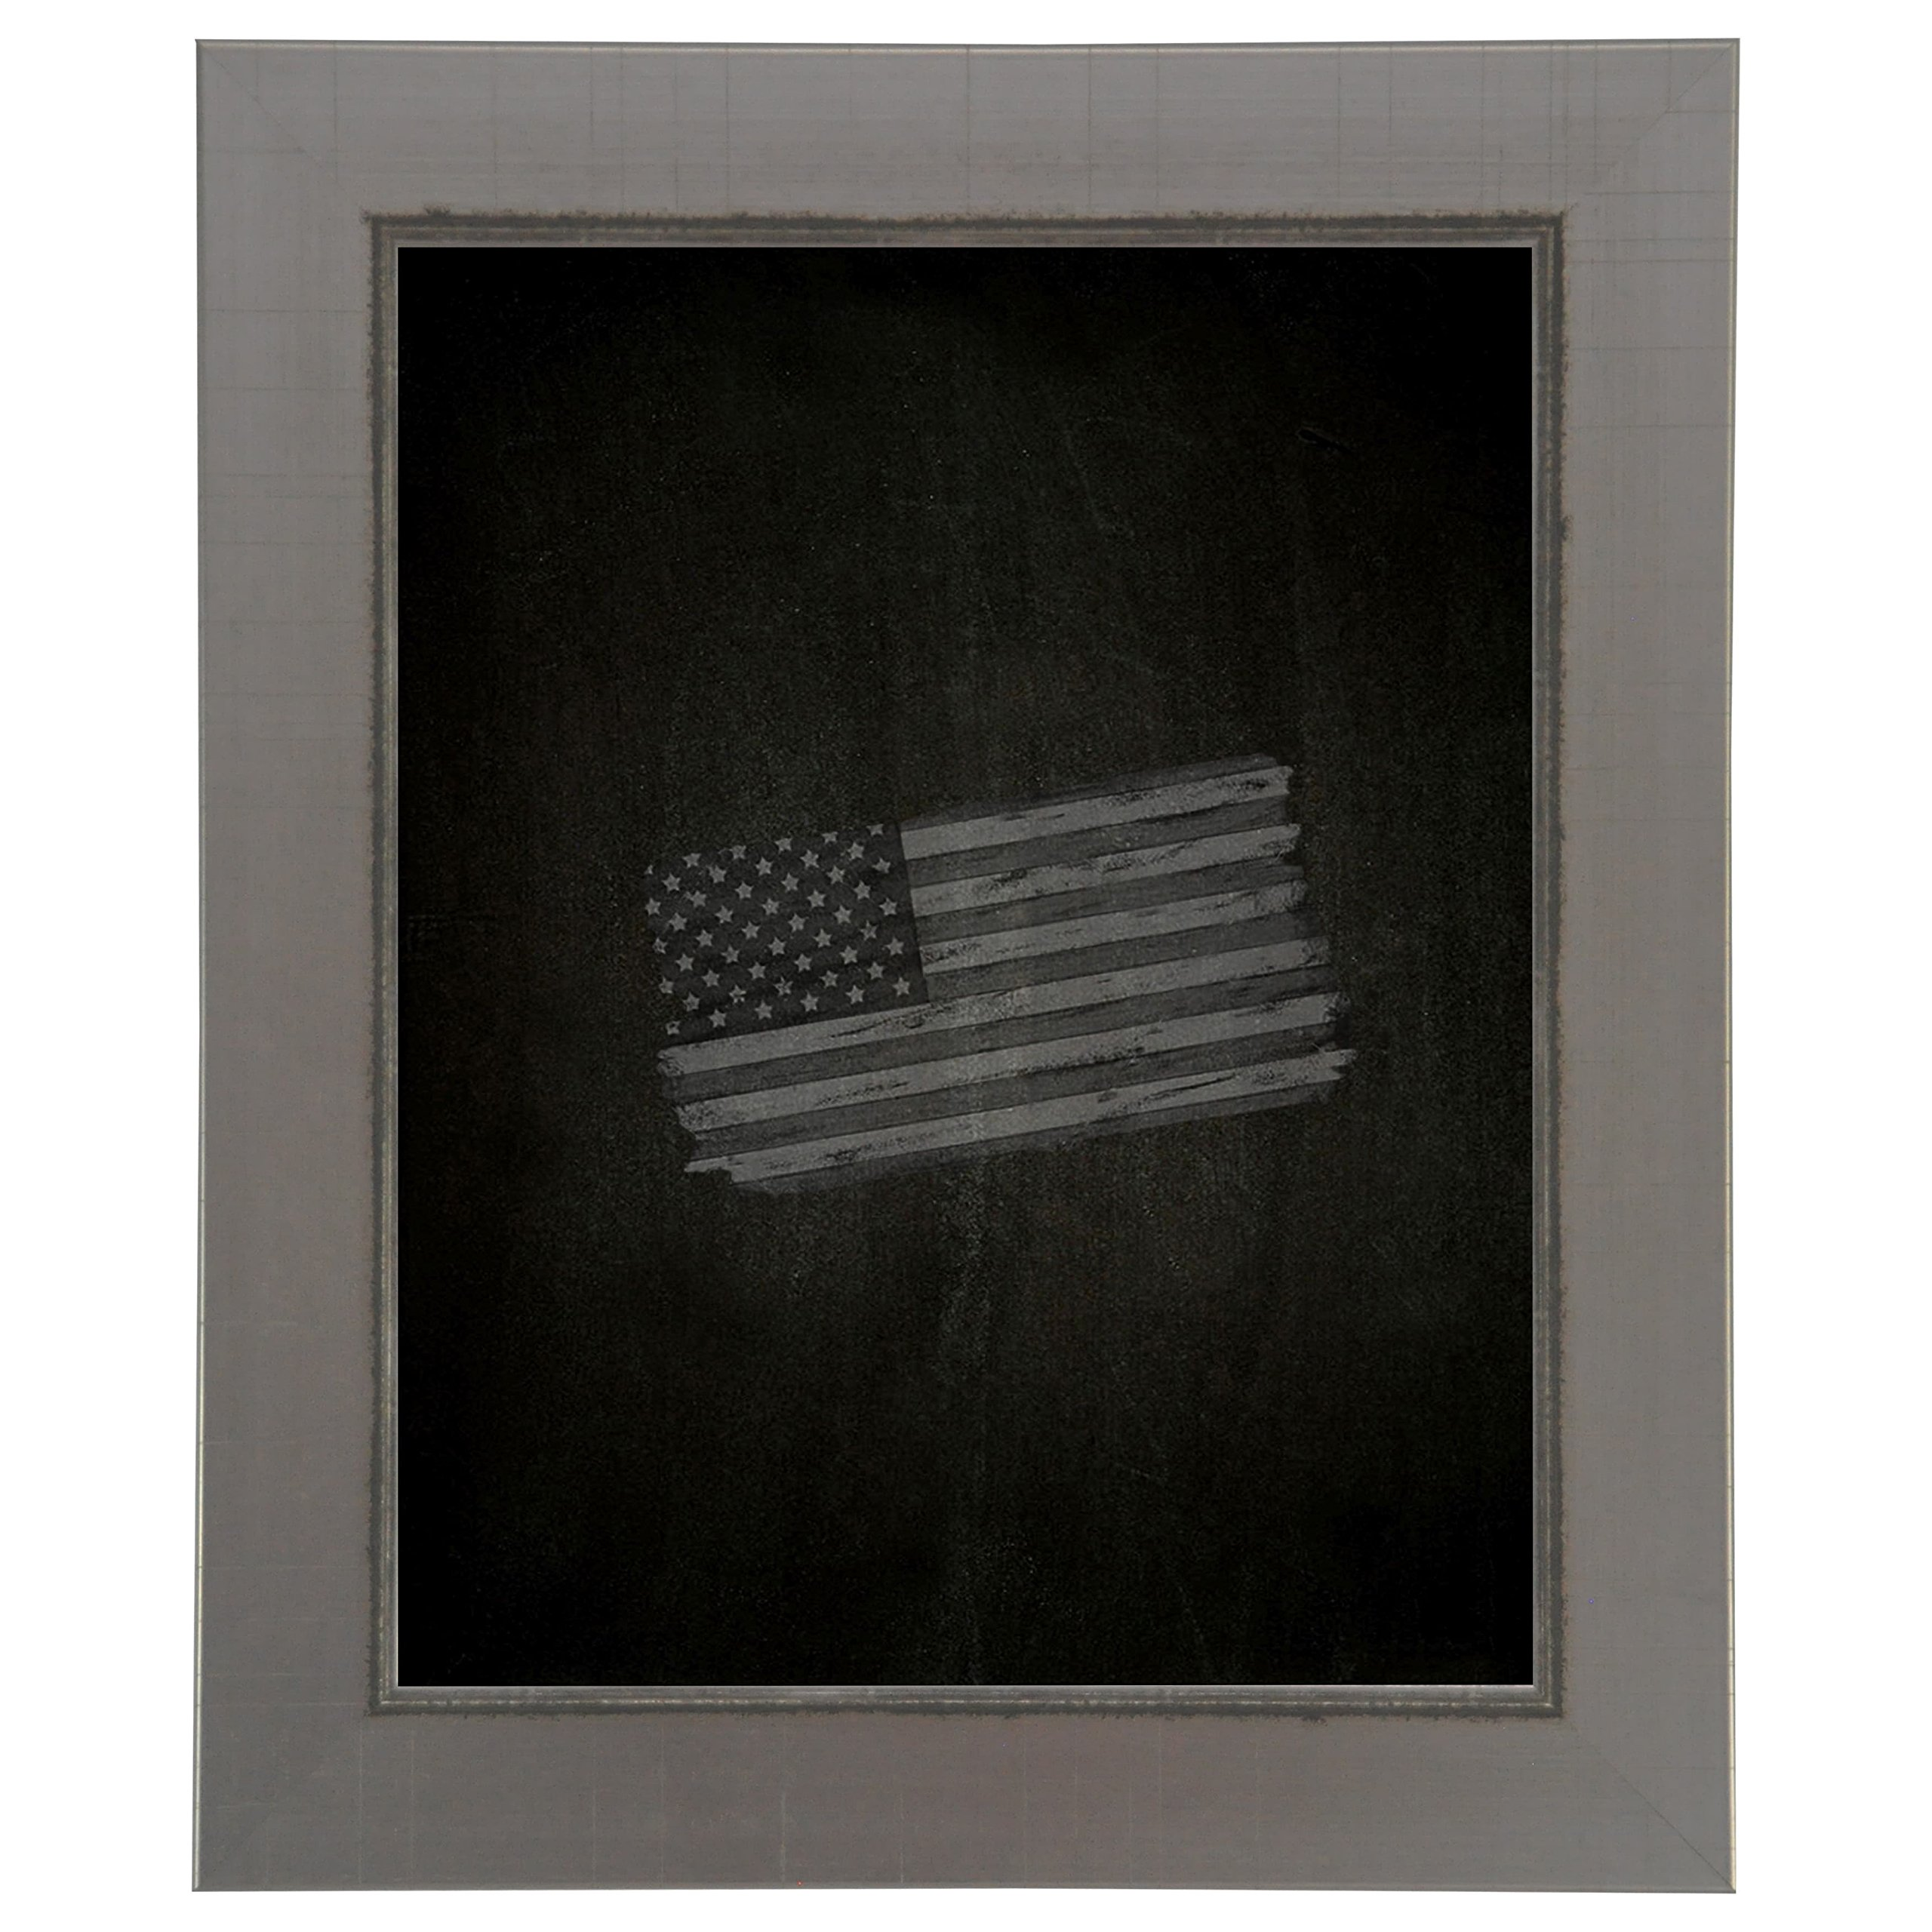 Rayne Mirrors American Made Rayne Silver Swift Blackboard/Chalkboard Exterior Size: 29 x 47 by Rayne Mirrors